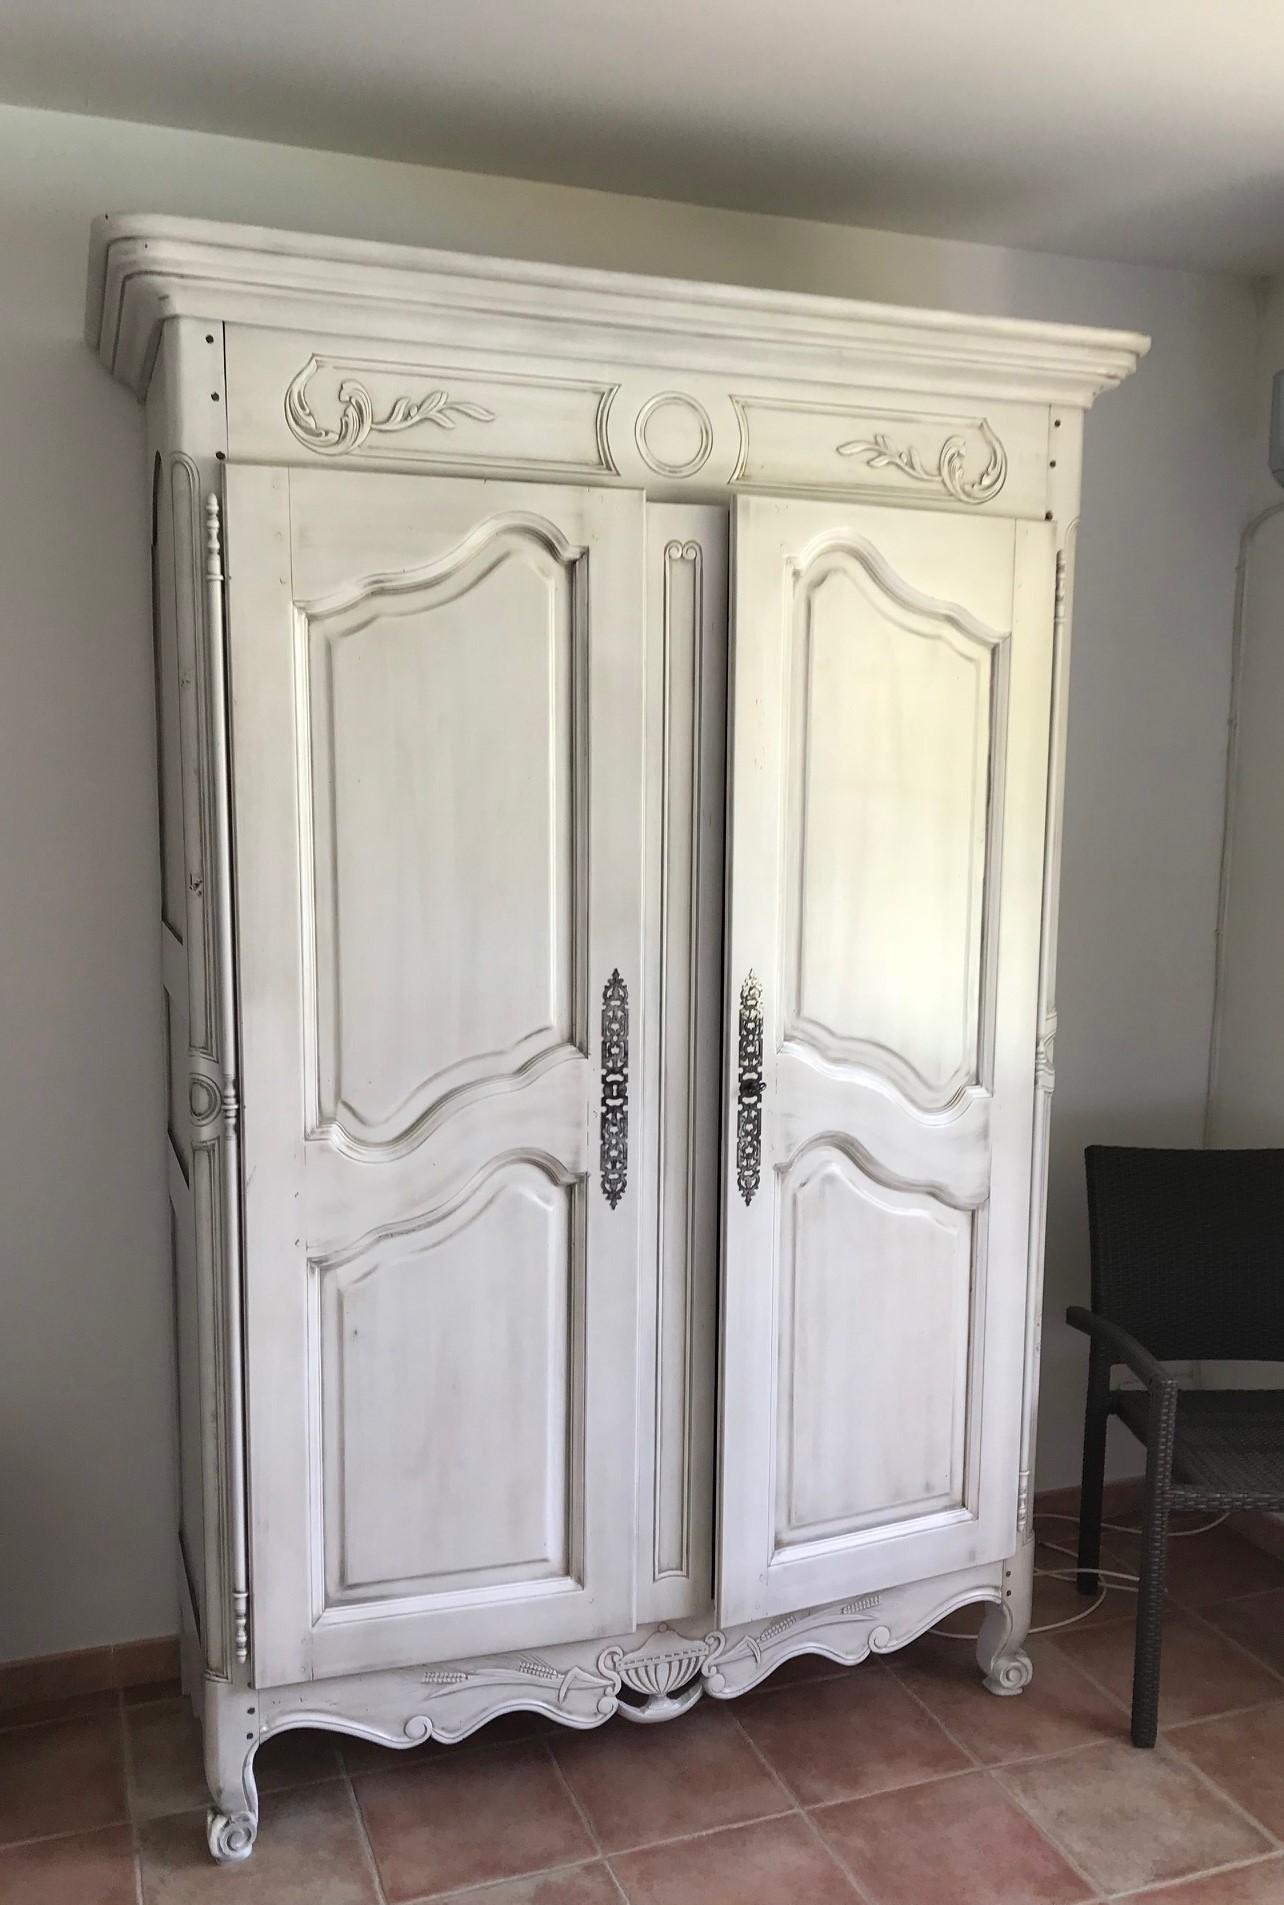 R alisations relooking d 39 une armoire normande en blanc oc an cassis - Prix d une armoire normande ...